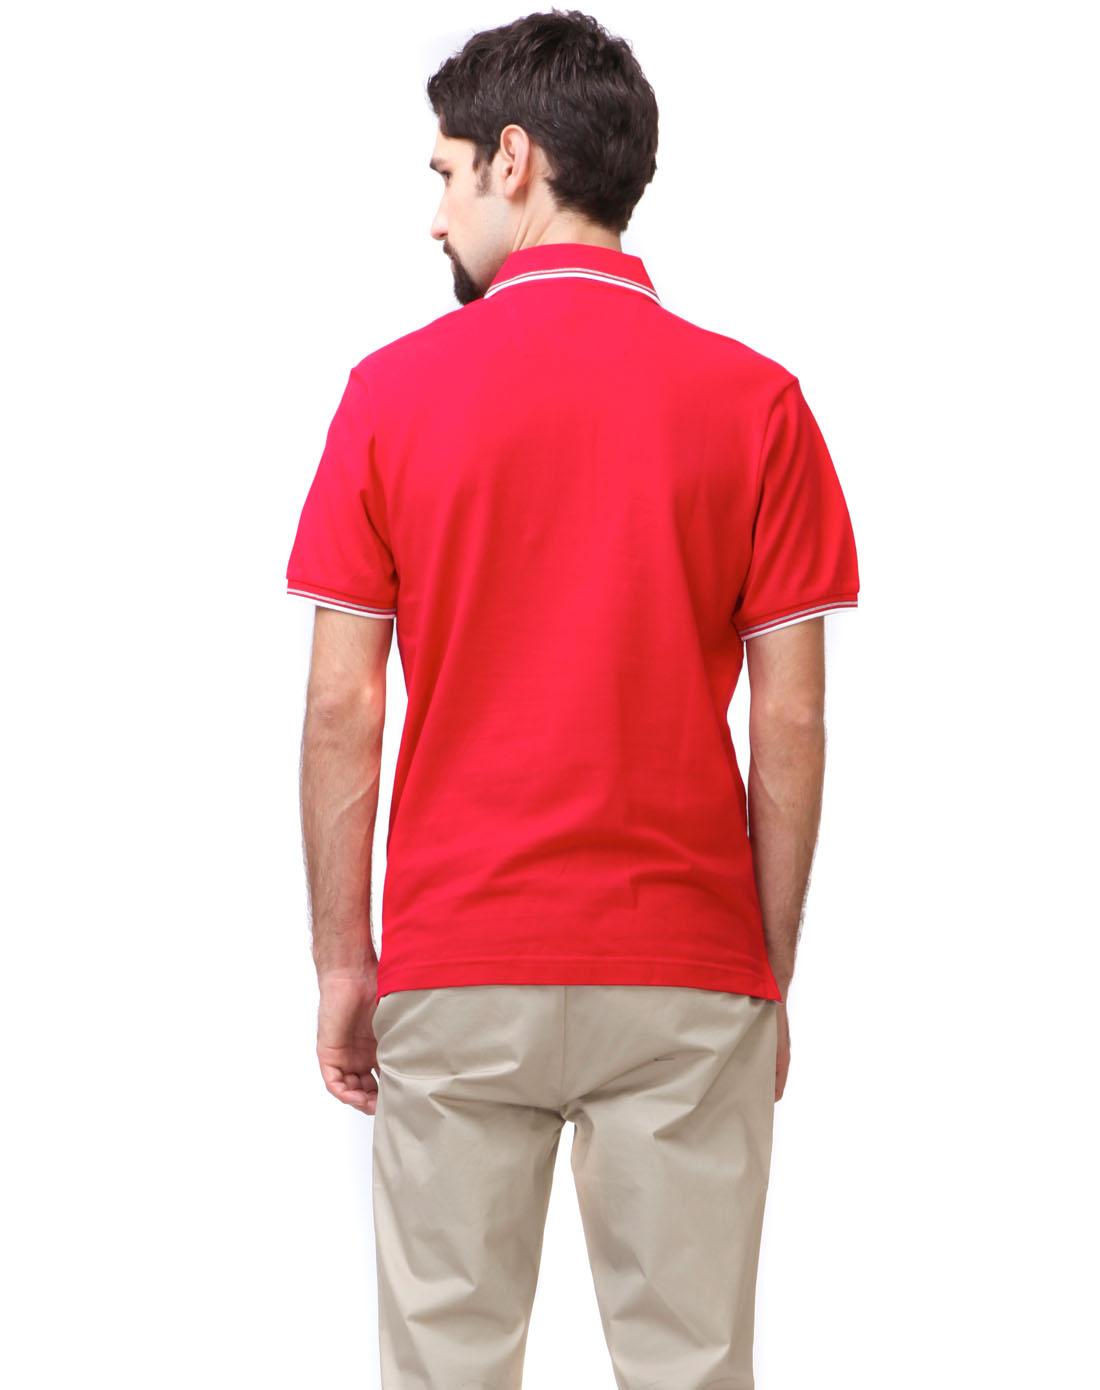 男士红色素色翻领t恤